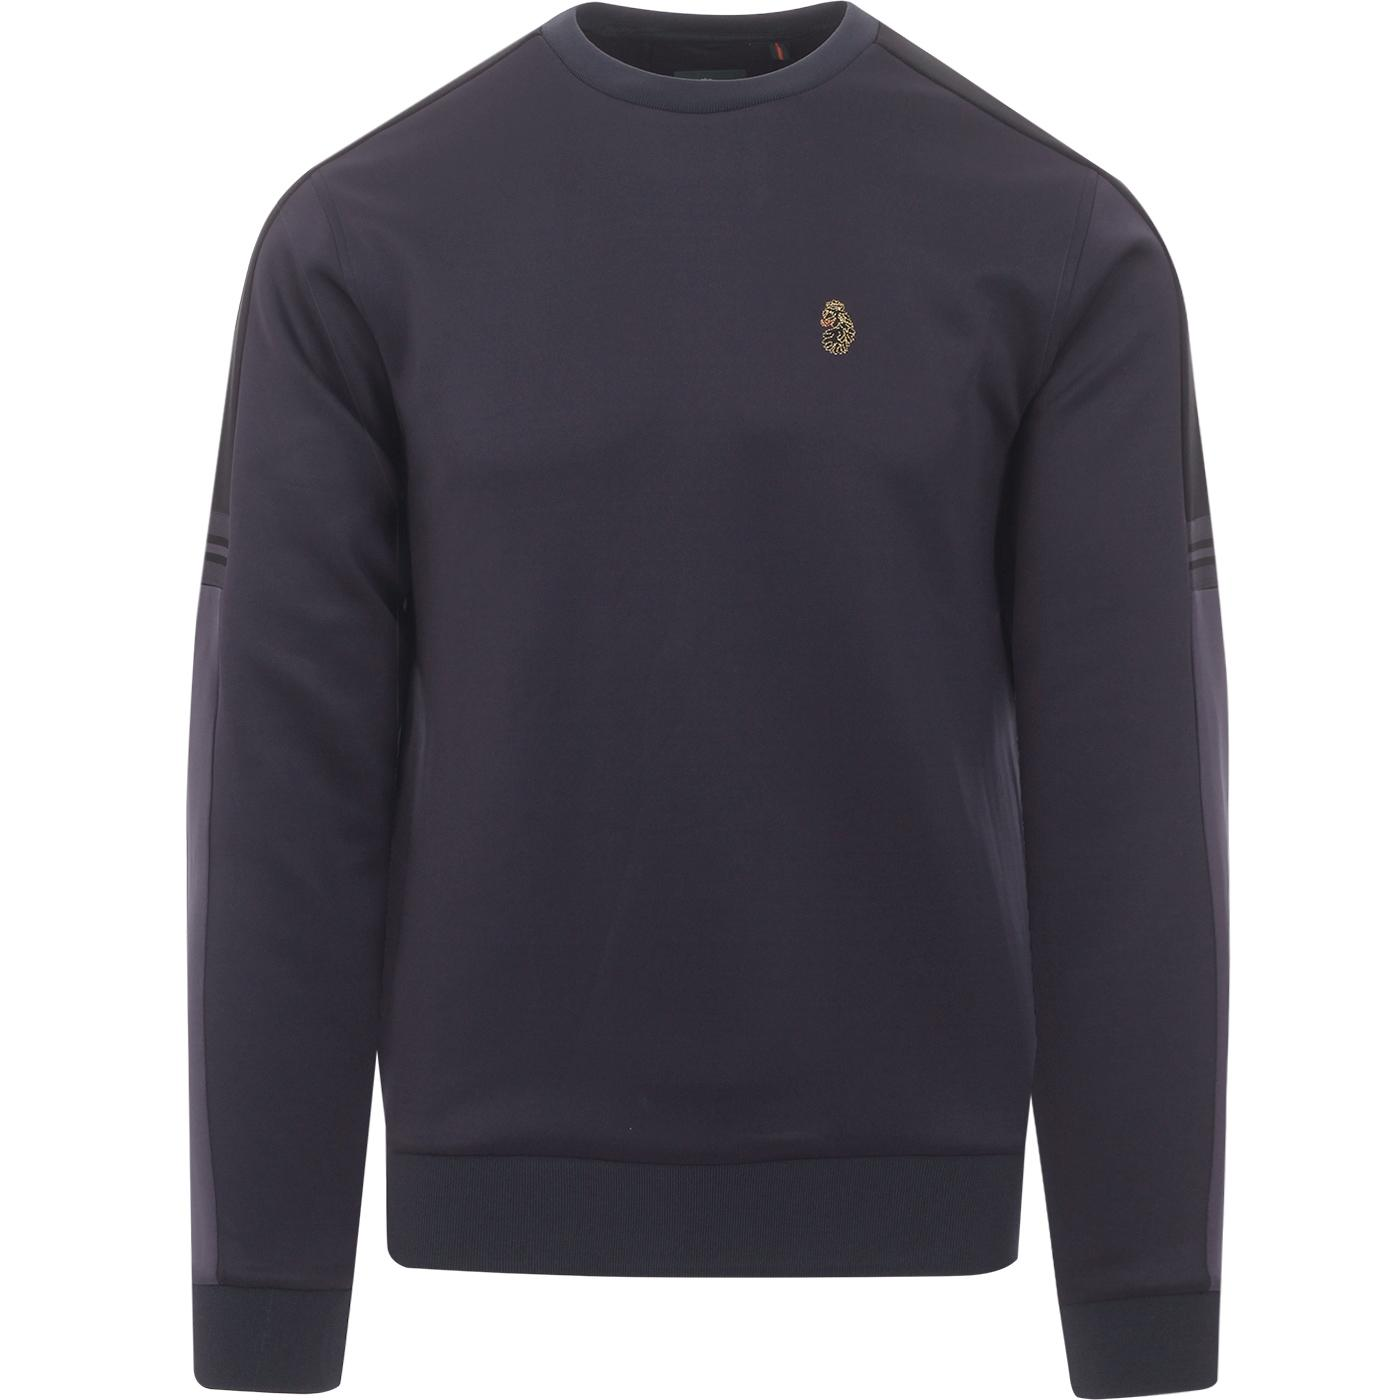 Patter LUKE 90s Colour Block Tape Trim Sweatshirt